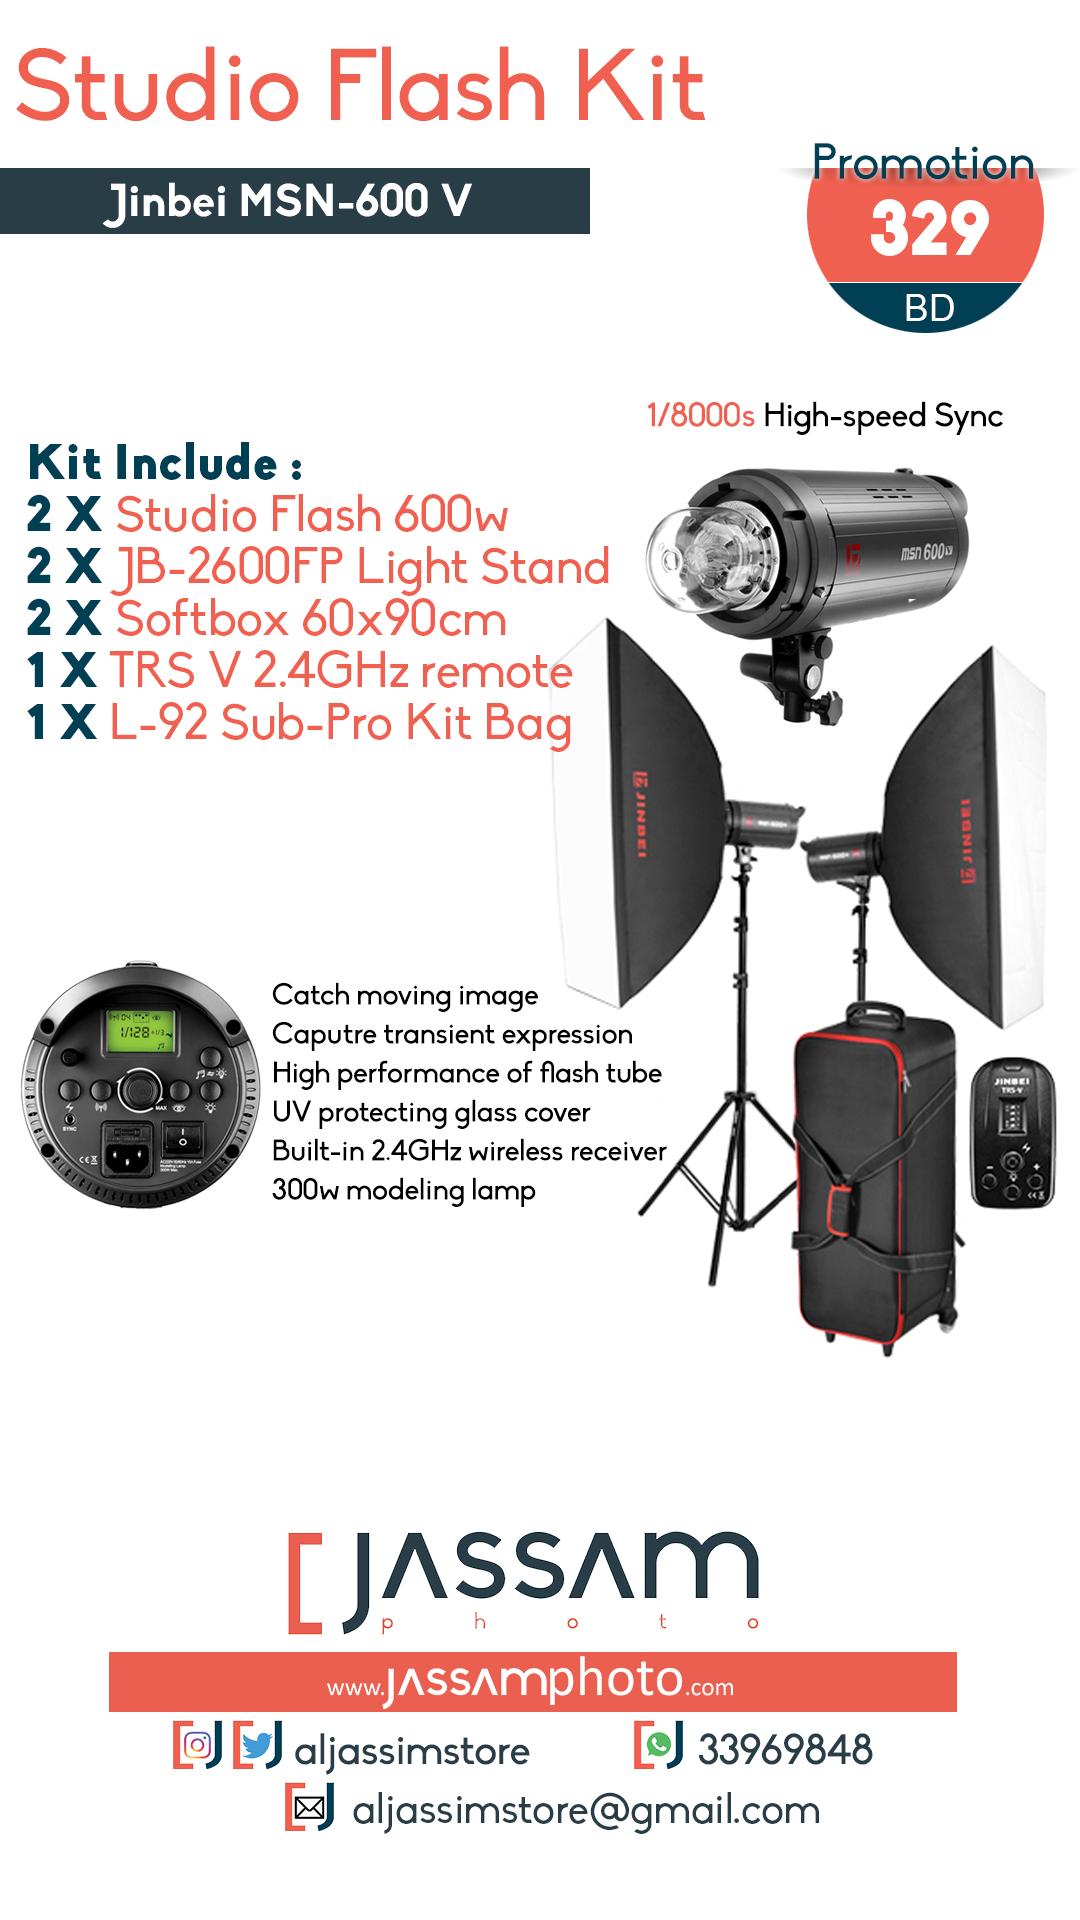 MSN-600V Flash Kit